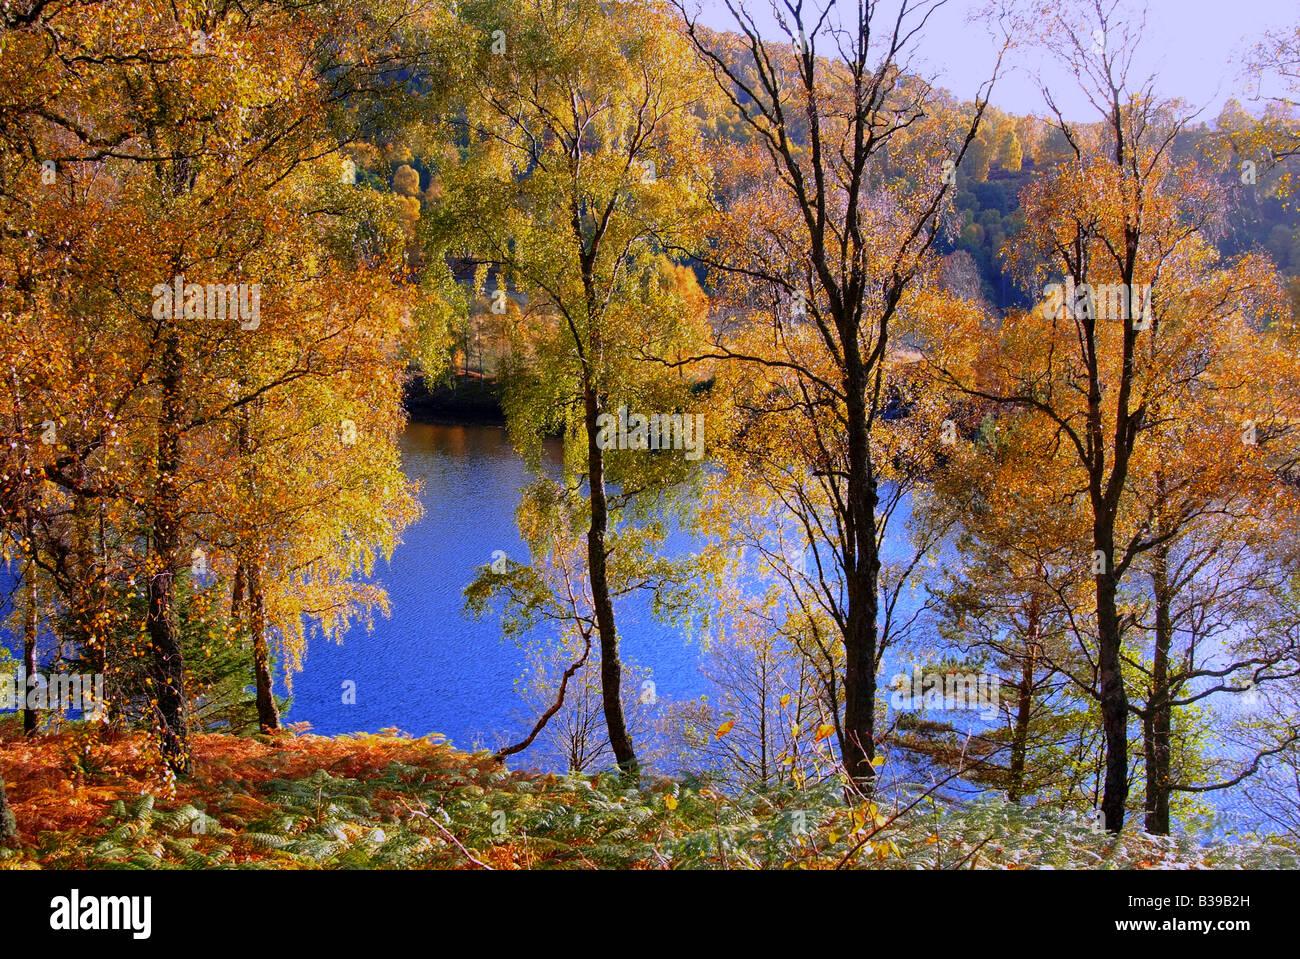 UK Schottland Tayside Perthshire Silber Birken im Herbst Loch tummel Stockbild